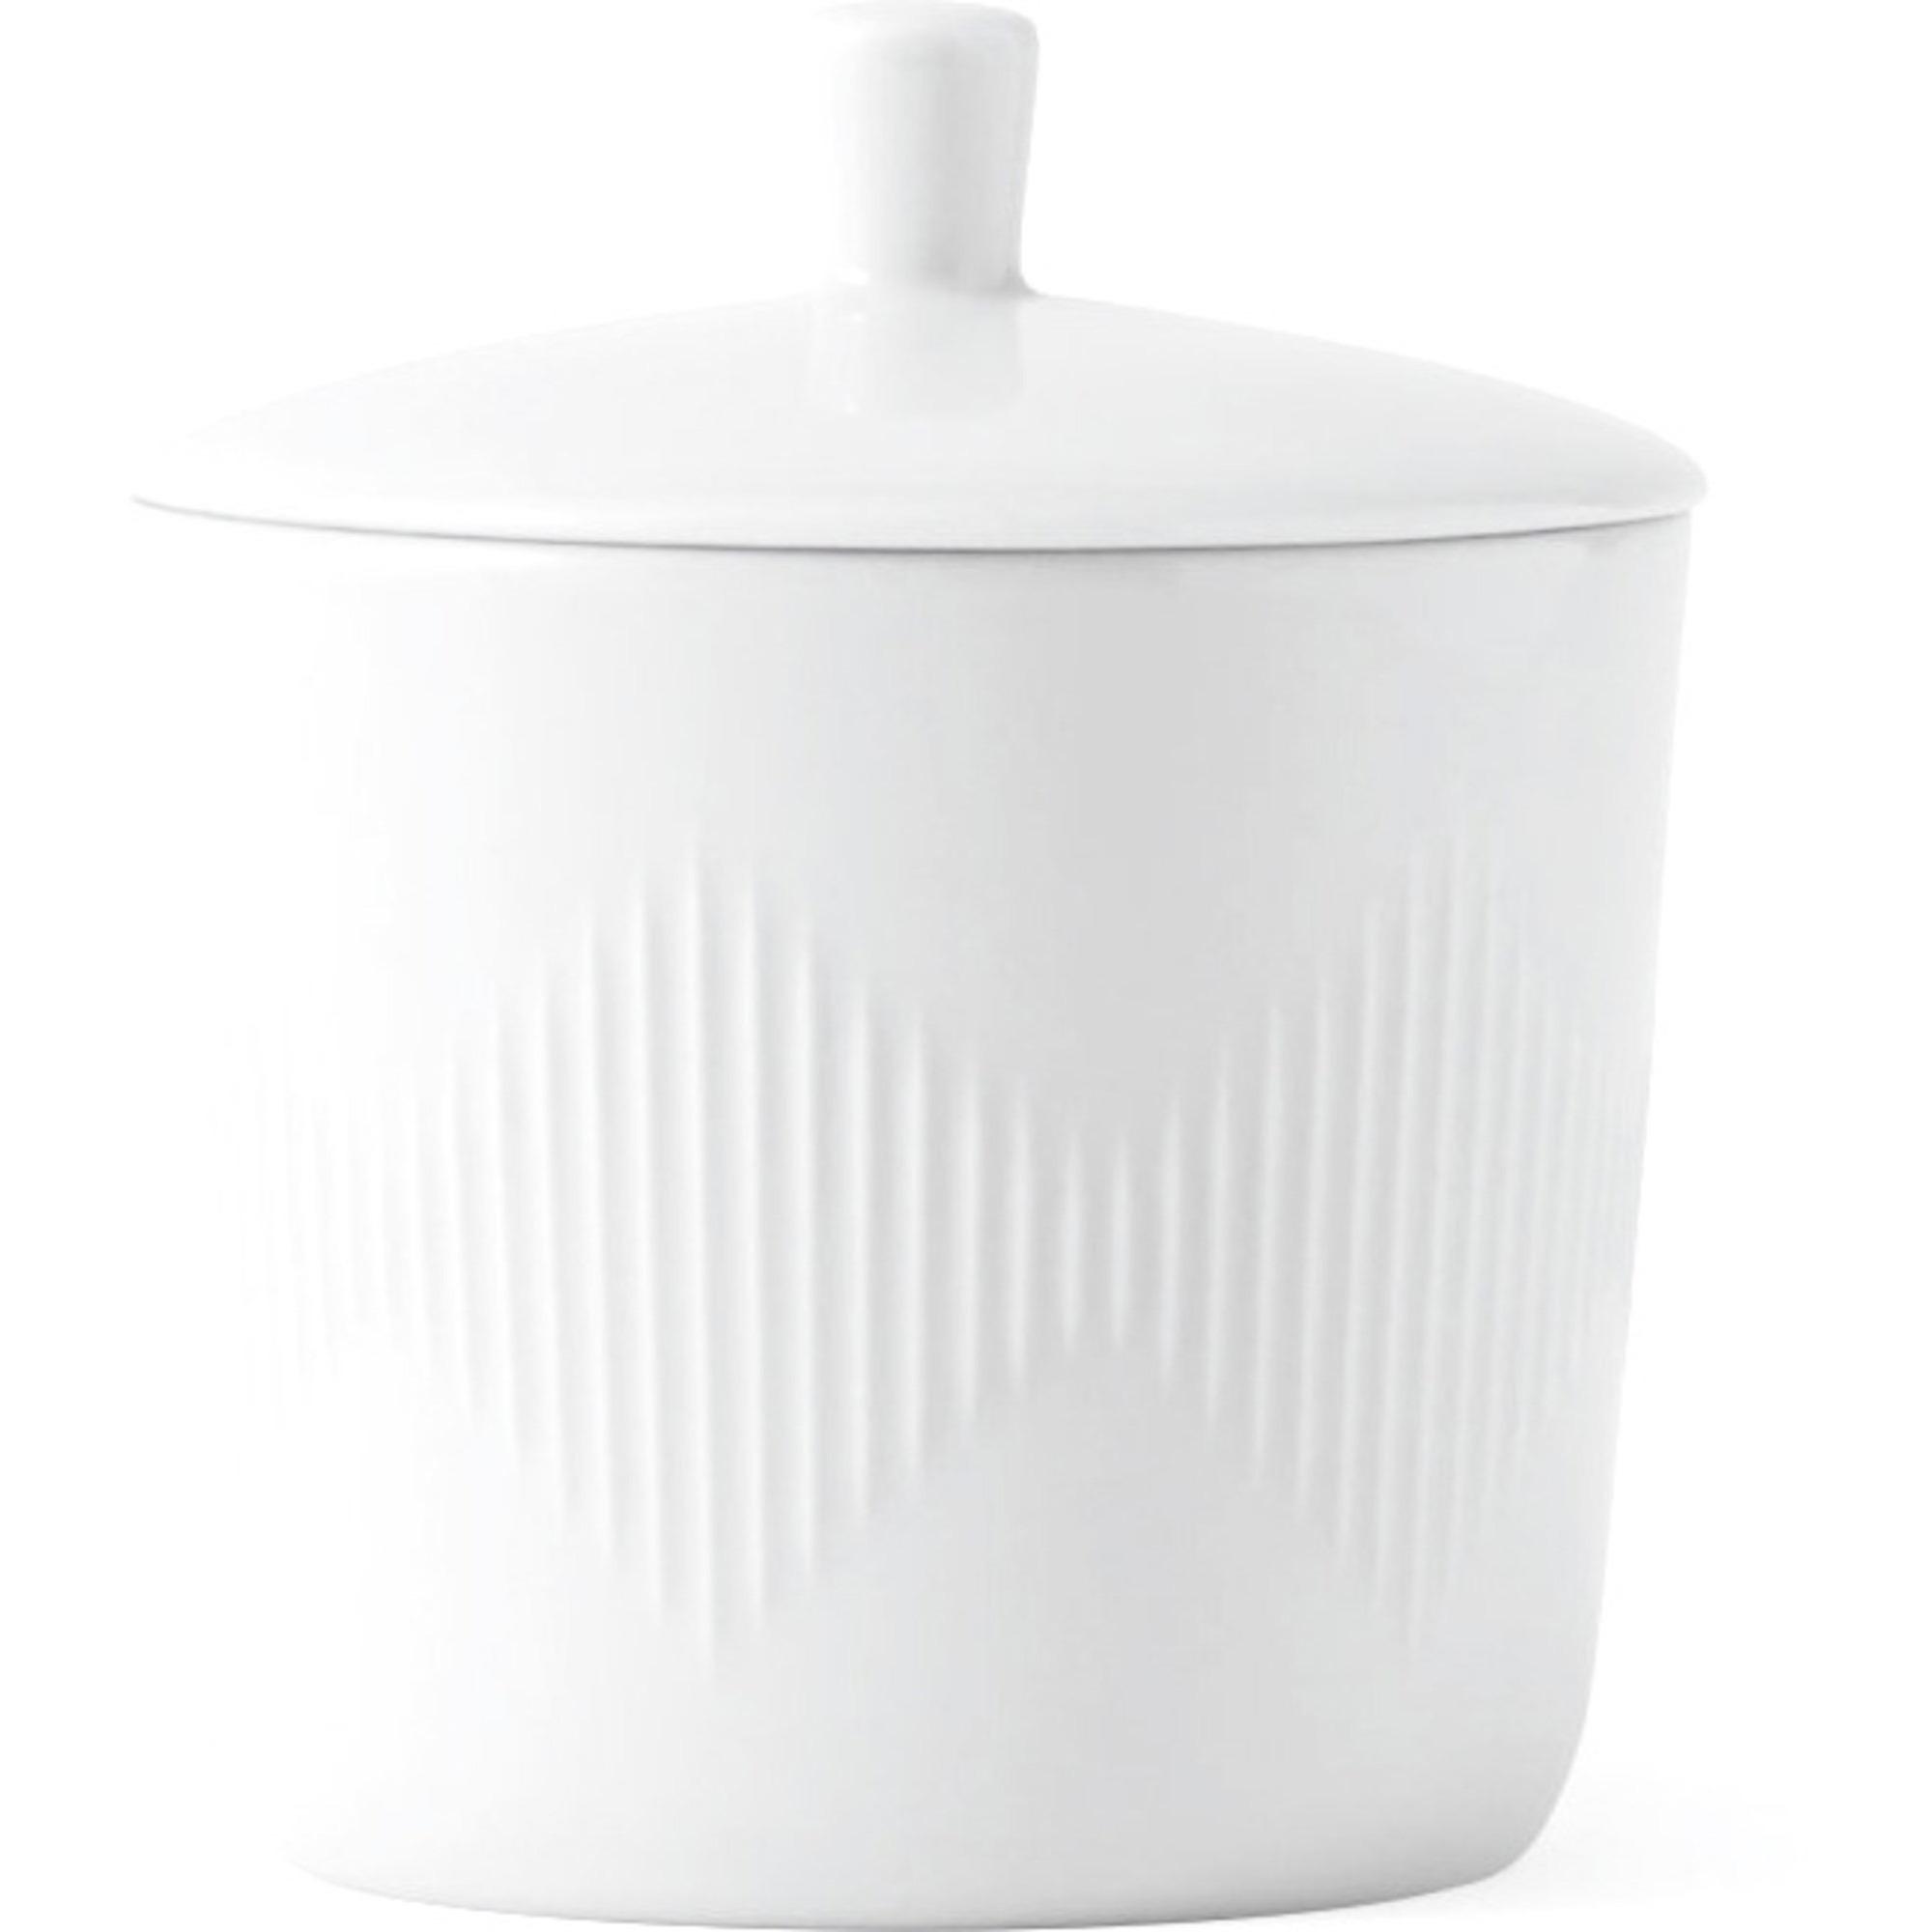 Lyngby Porcelæn Thermodan sockerskål